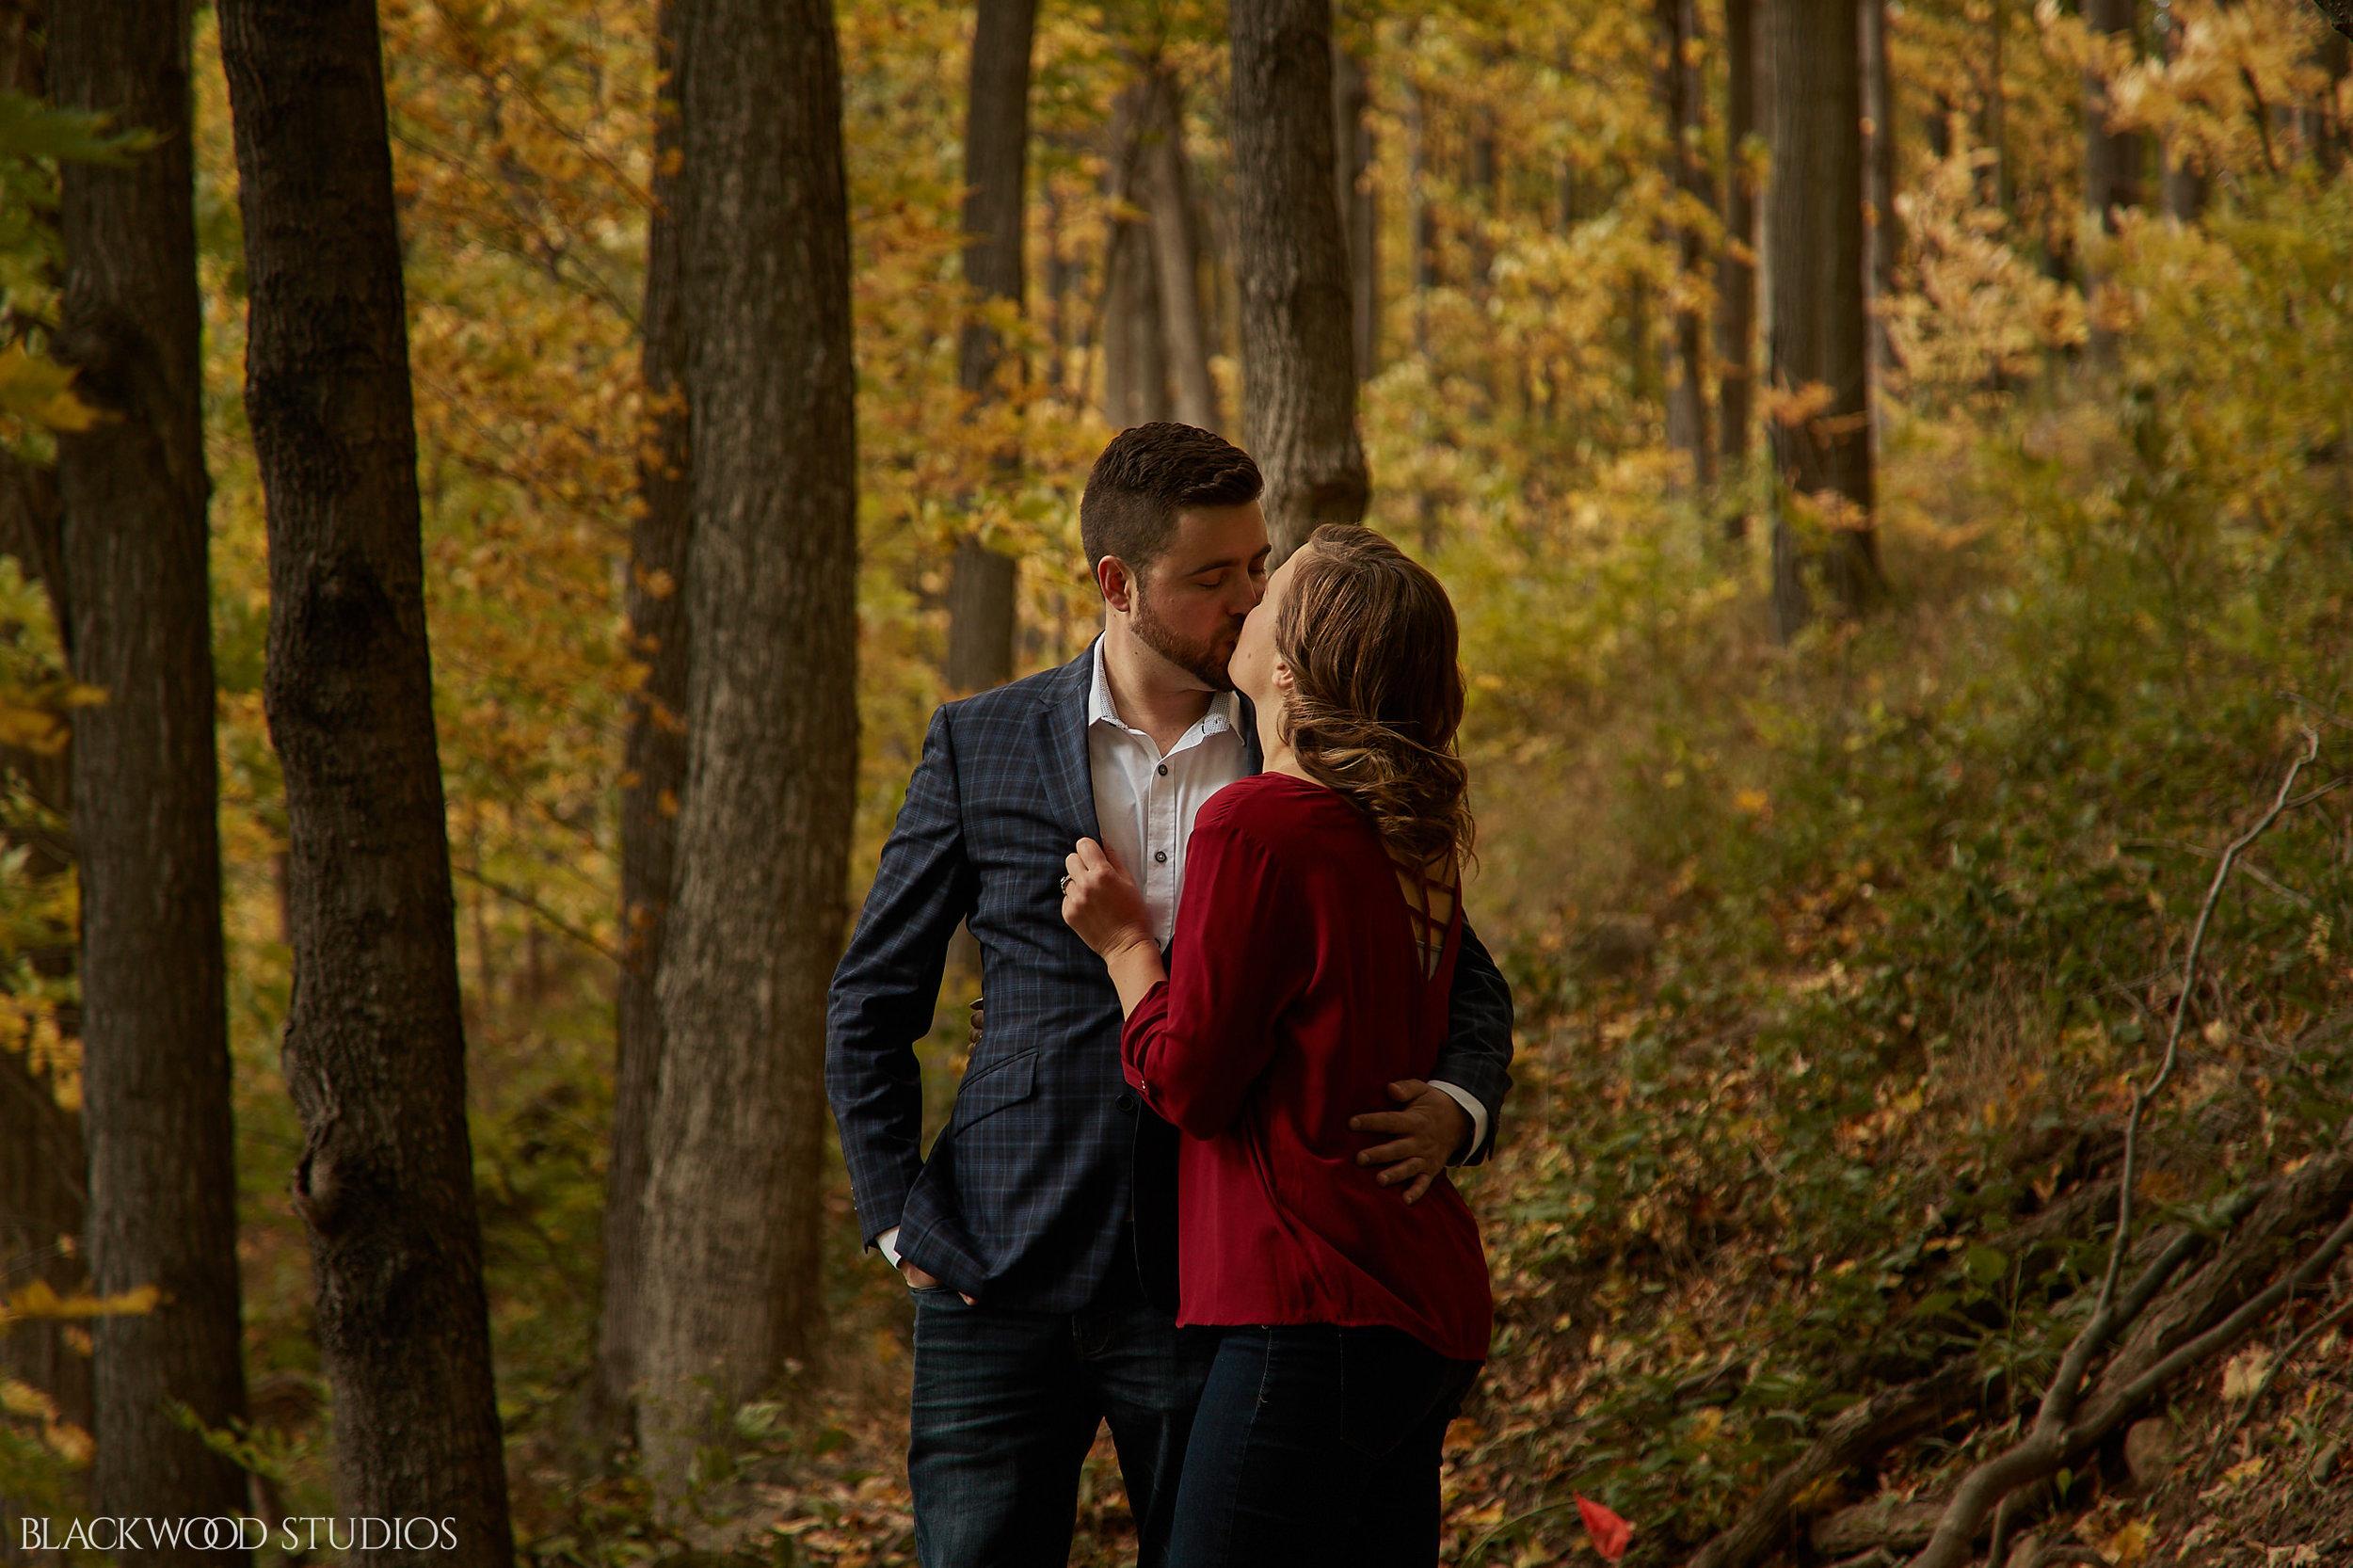 Blackwood-Studios-20181014-151041-Dave-and-Natalie-Engagement-0126-Rattlesnake-Point-Conservation-Area-Milton-Ontario.jpg